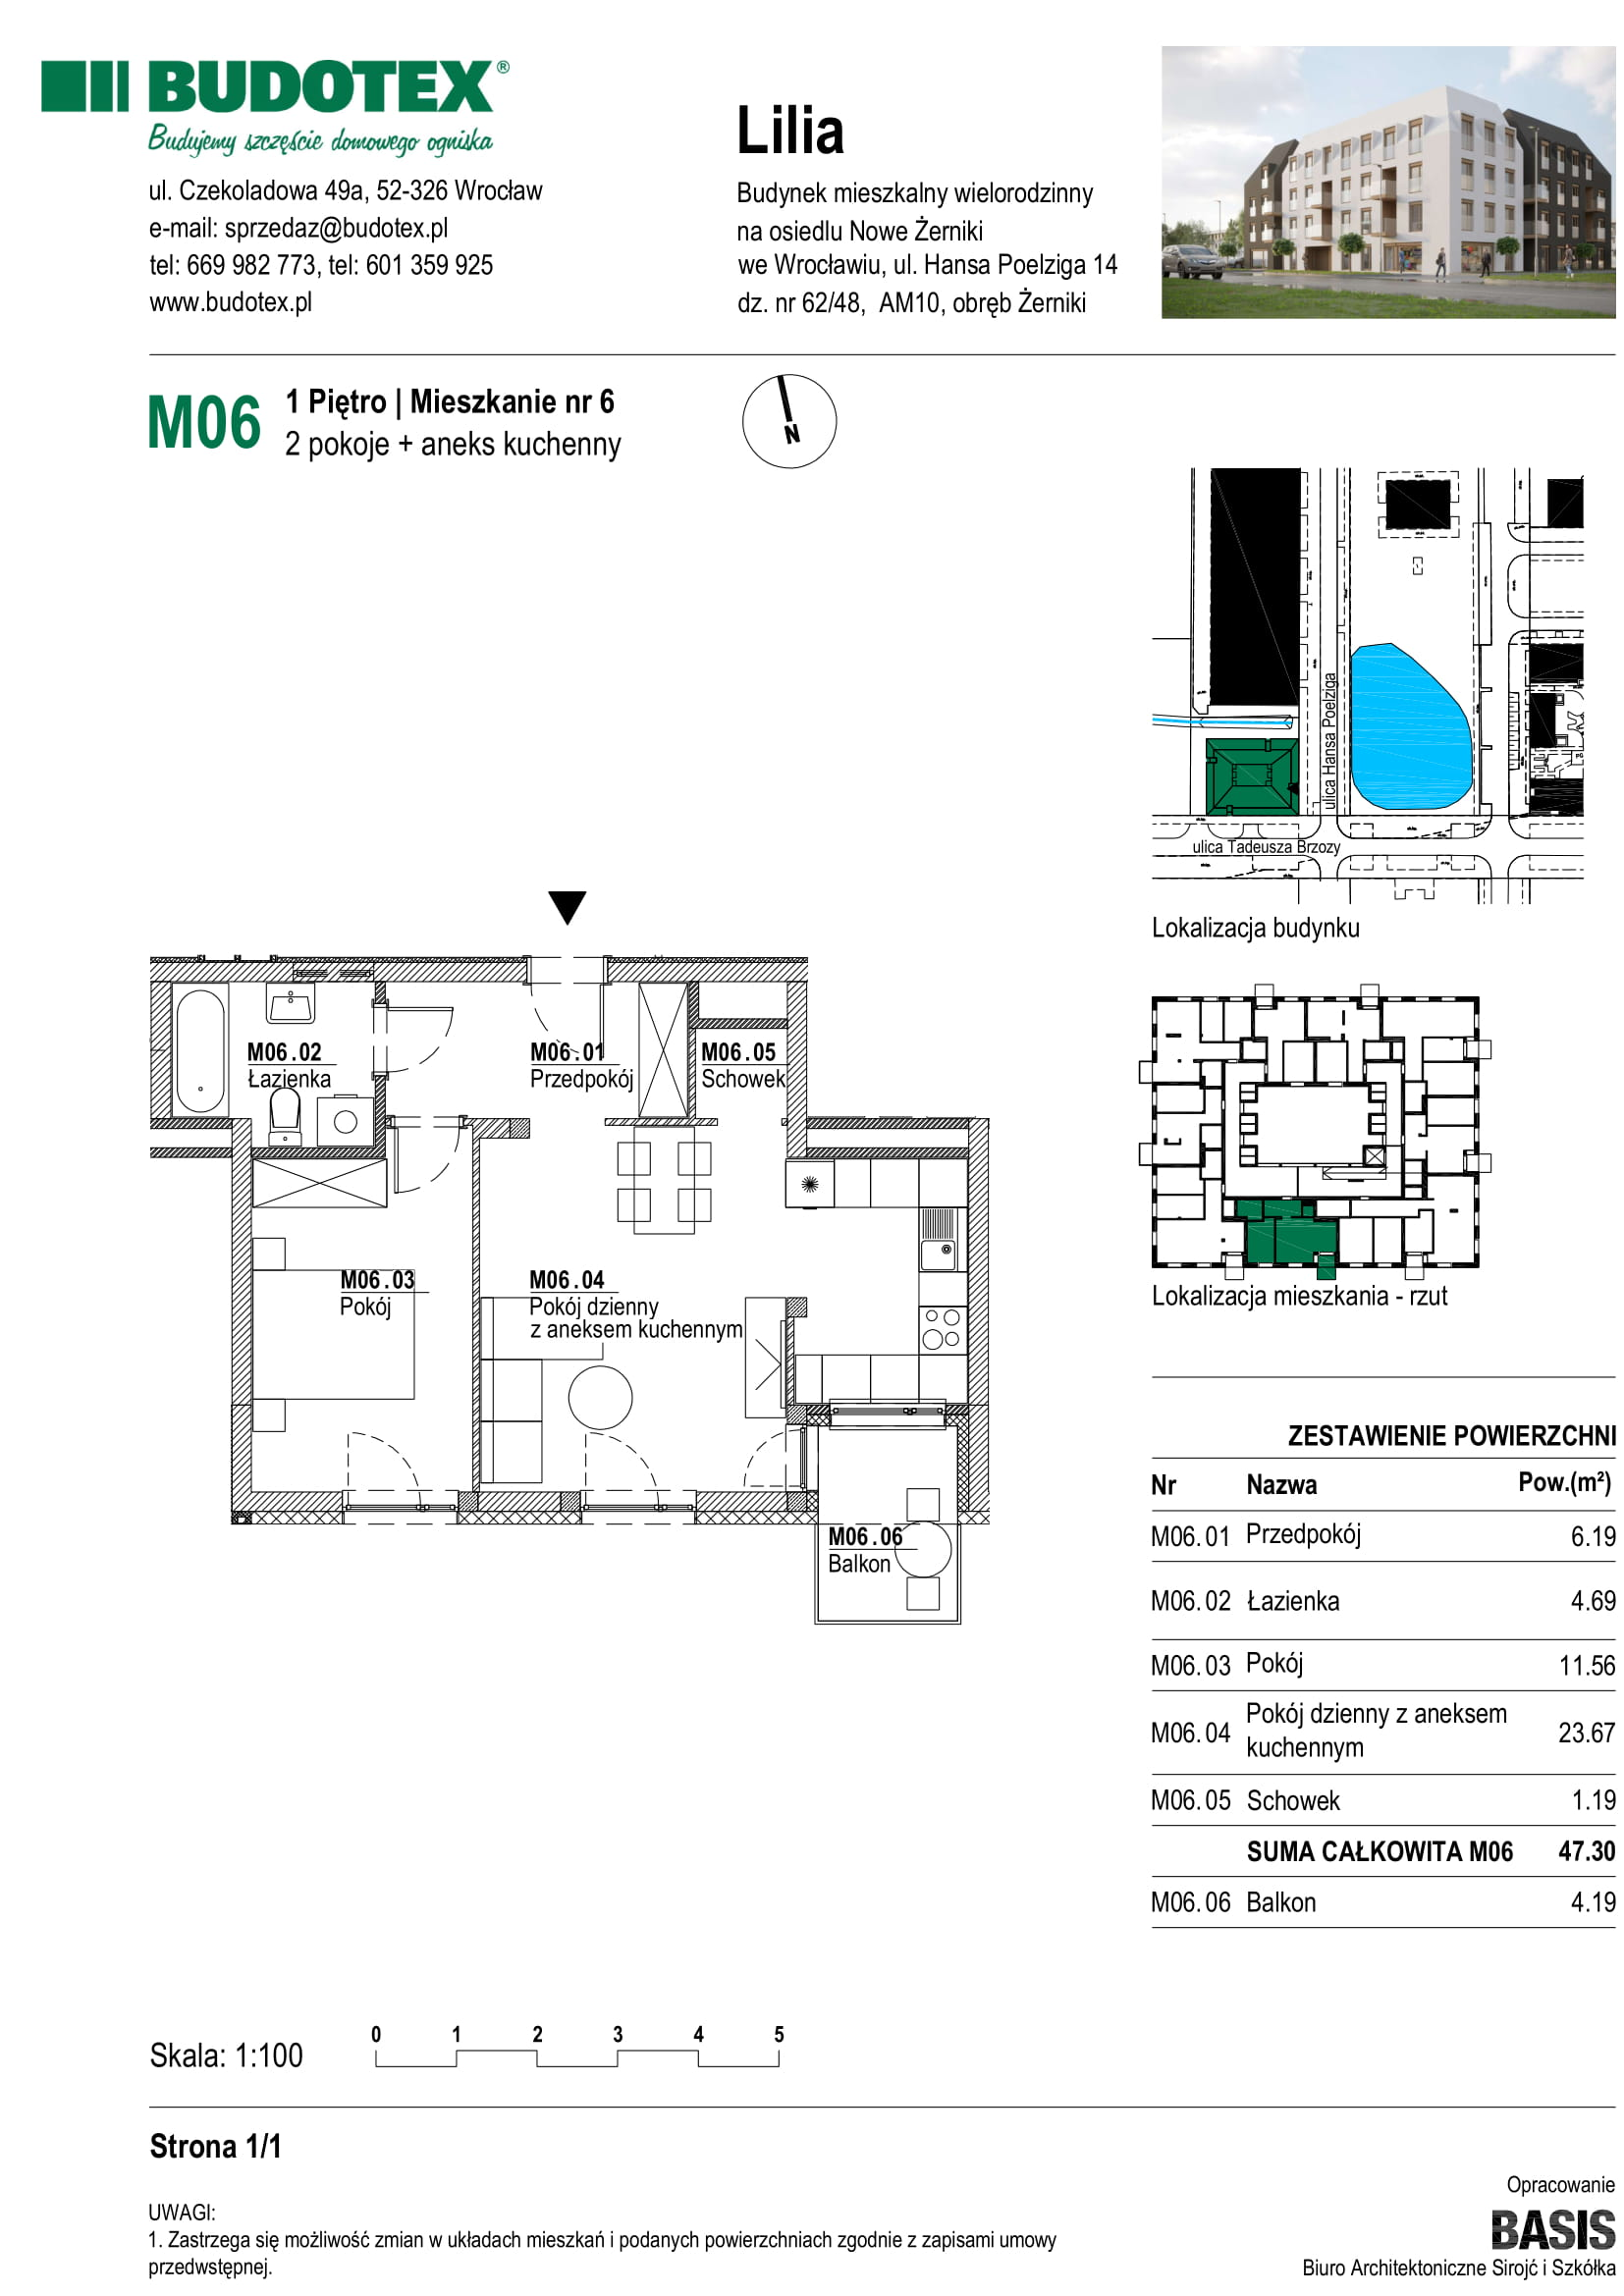 Mieszkanie nr M06